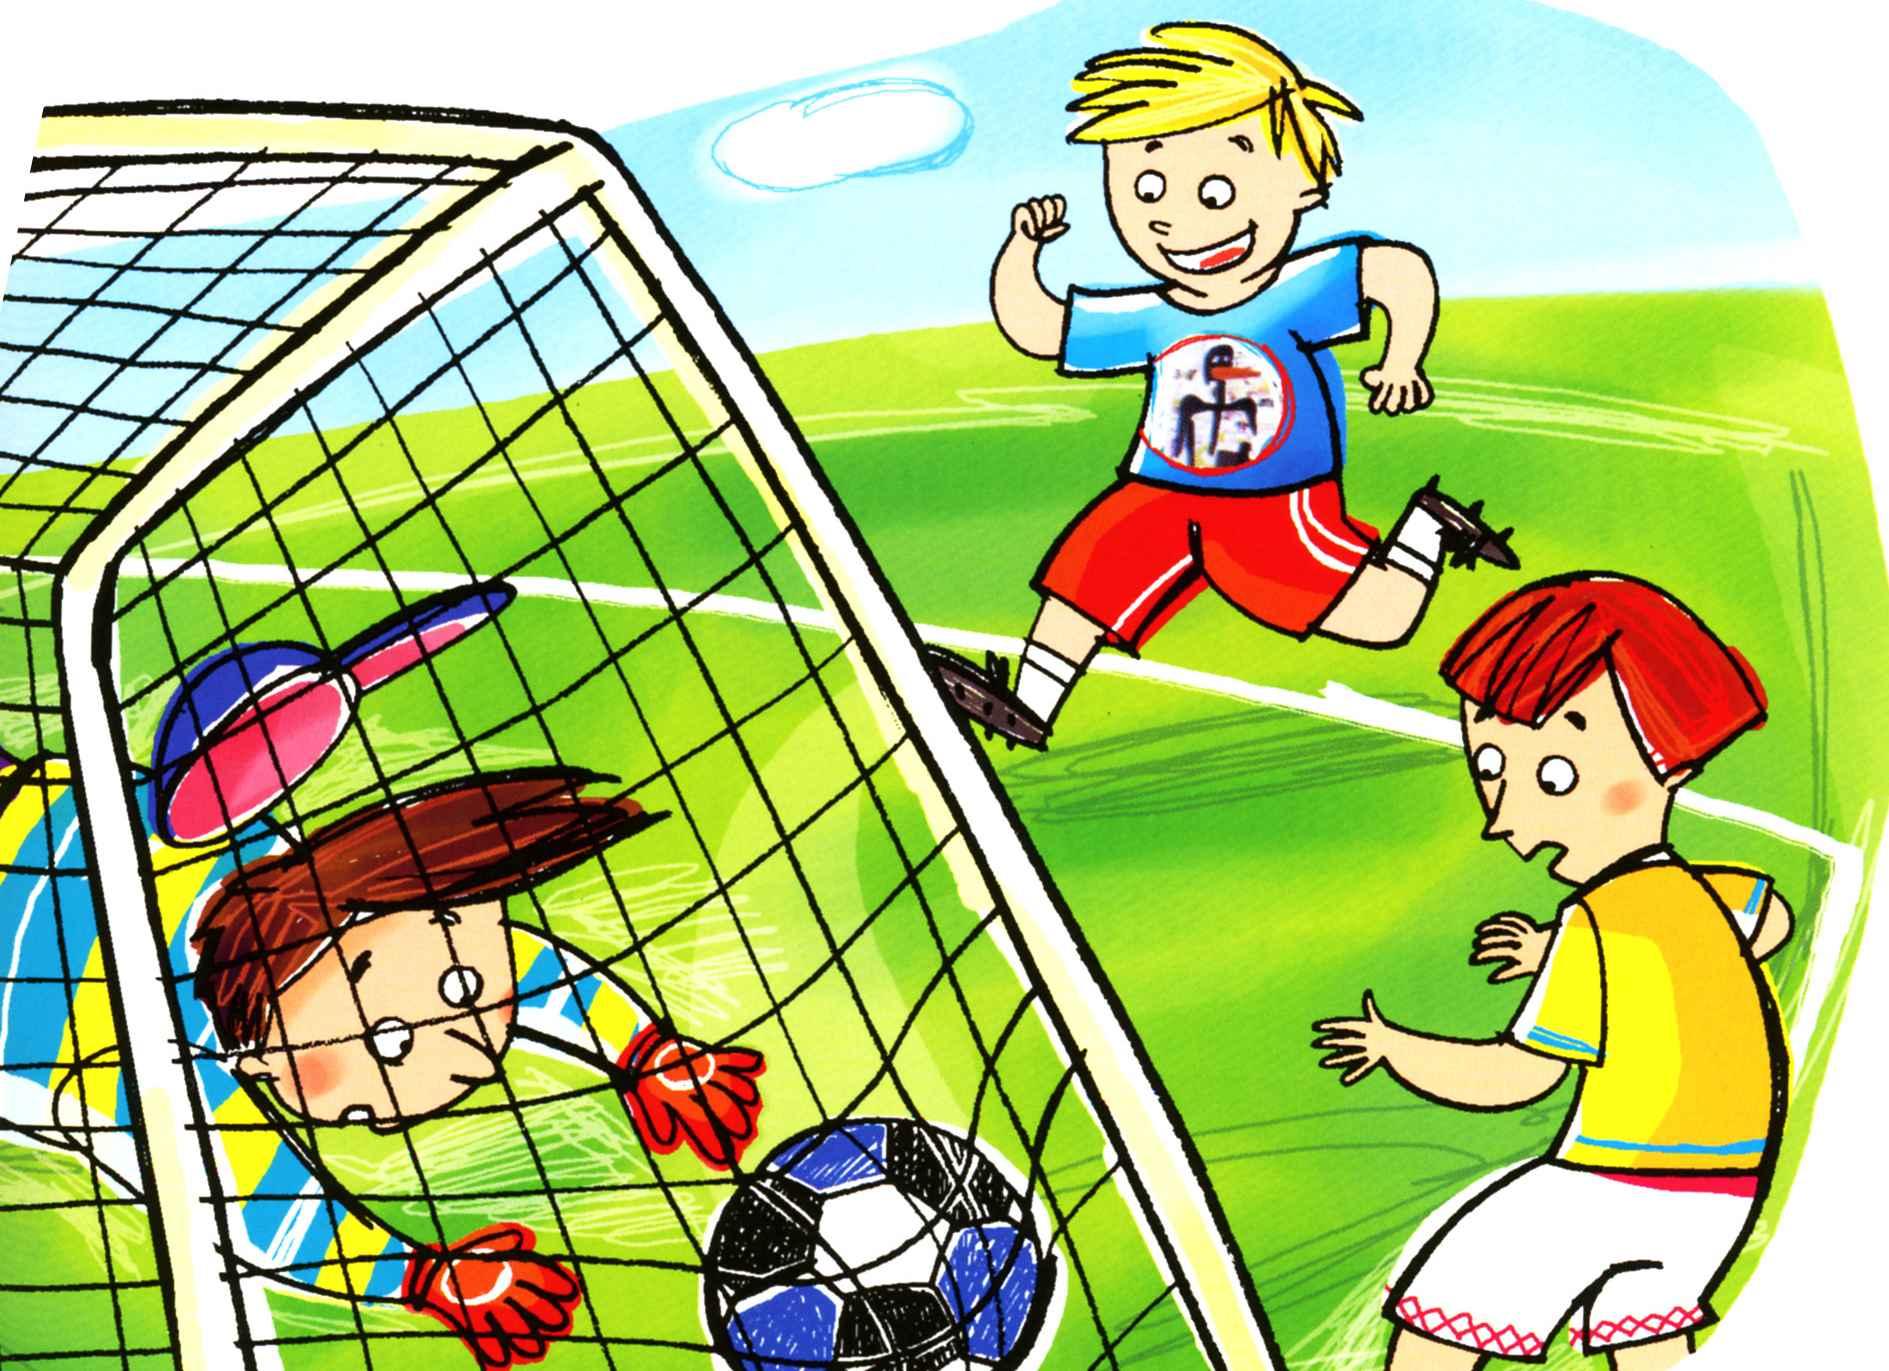 bambini-gioco-calcio